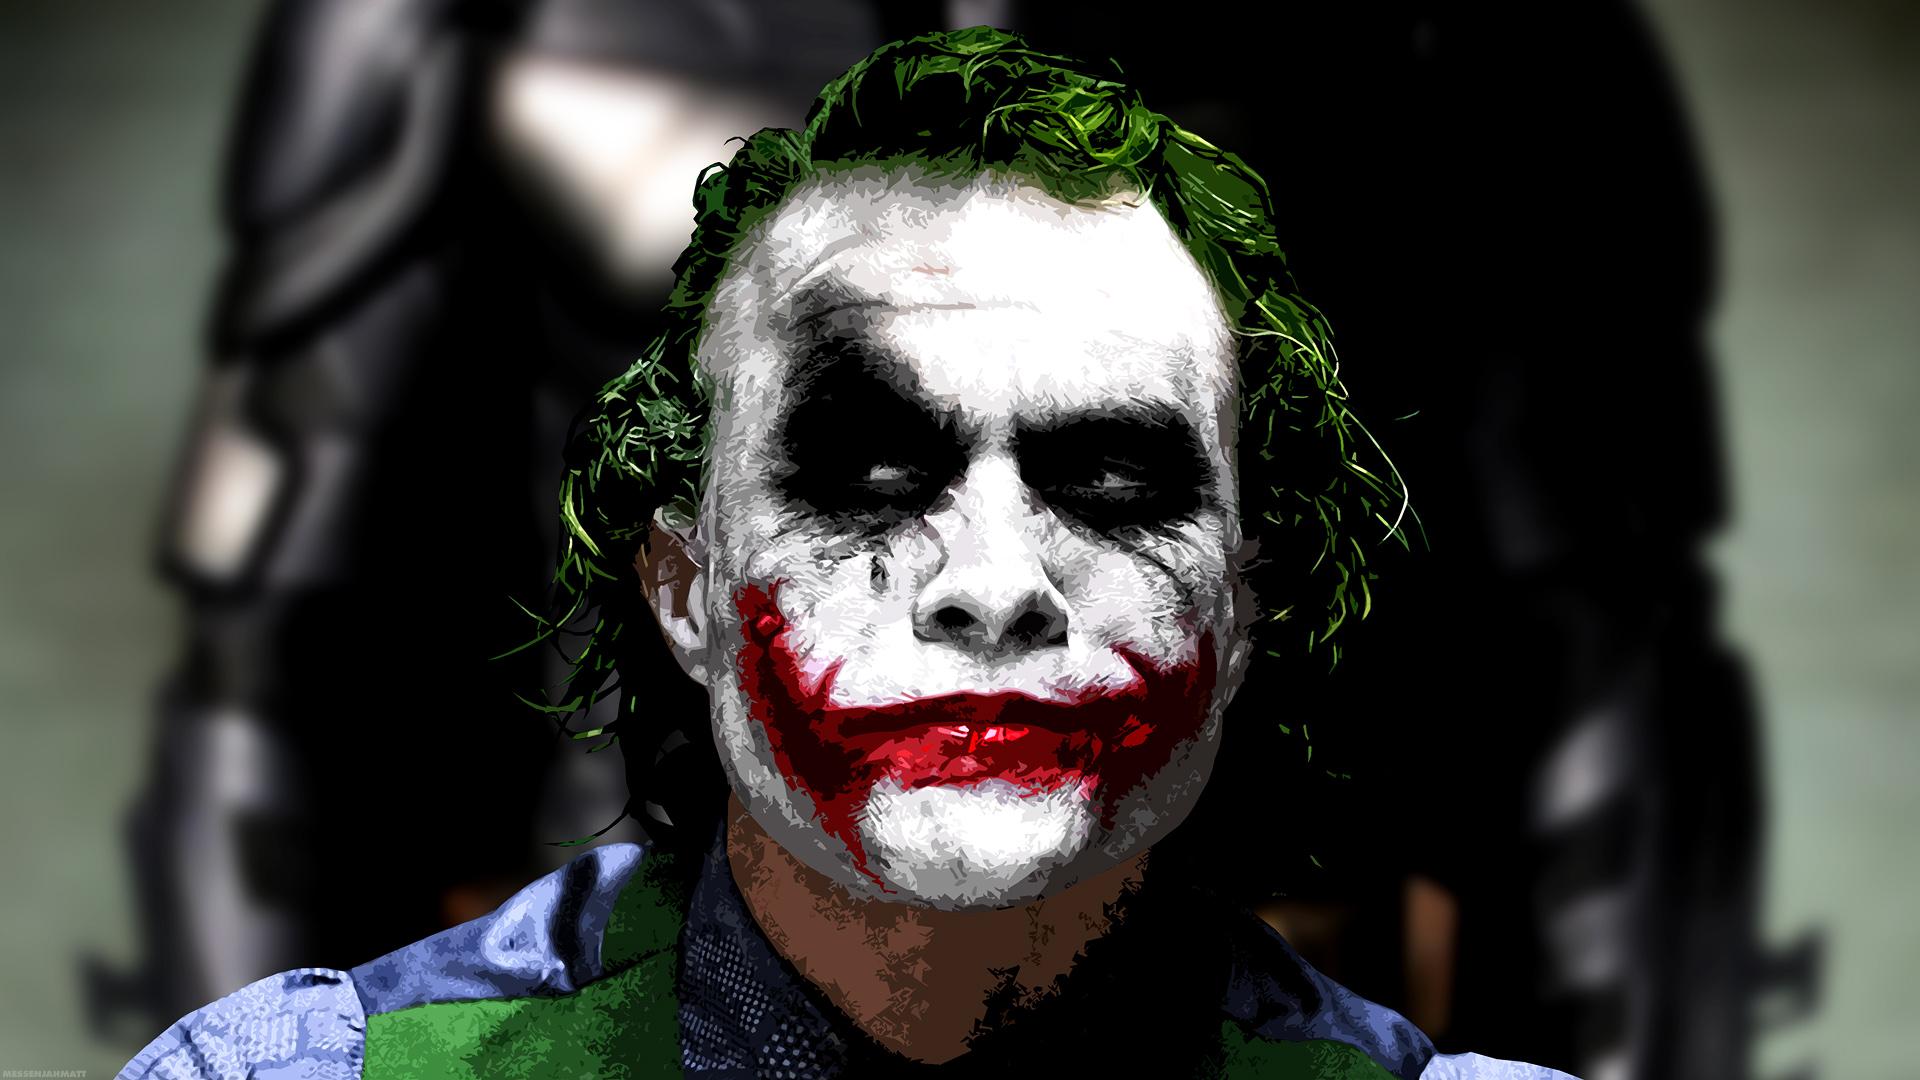 joker   The Joker Wallpaper 28092805 1920x1080